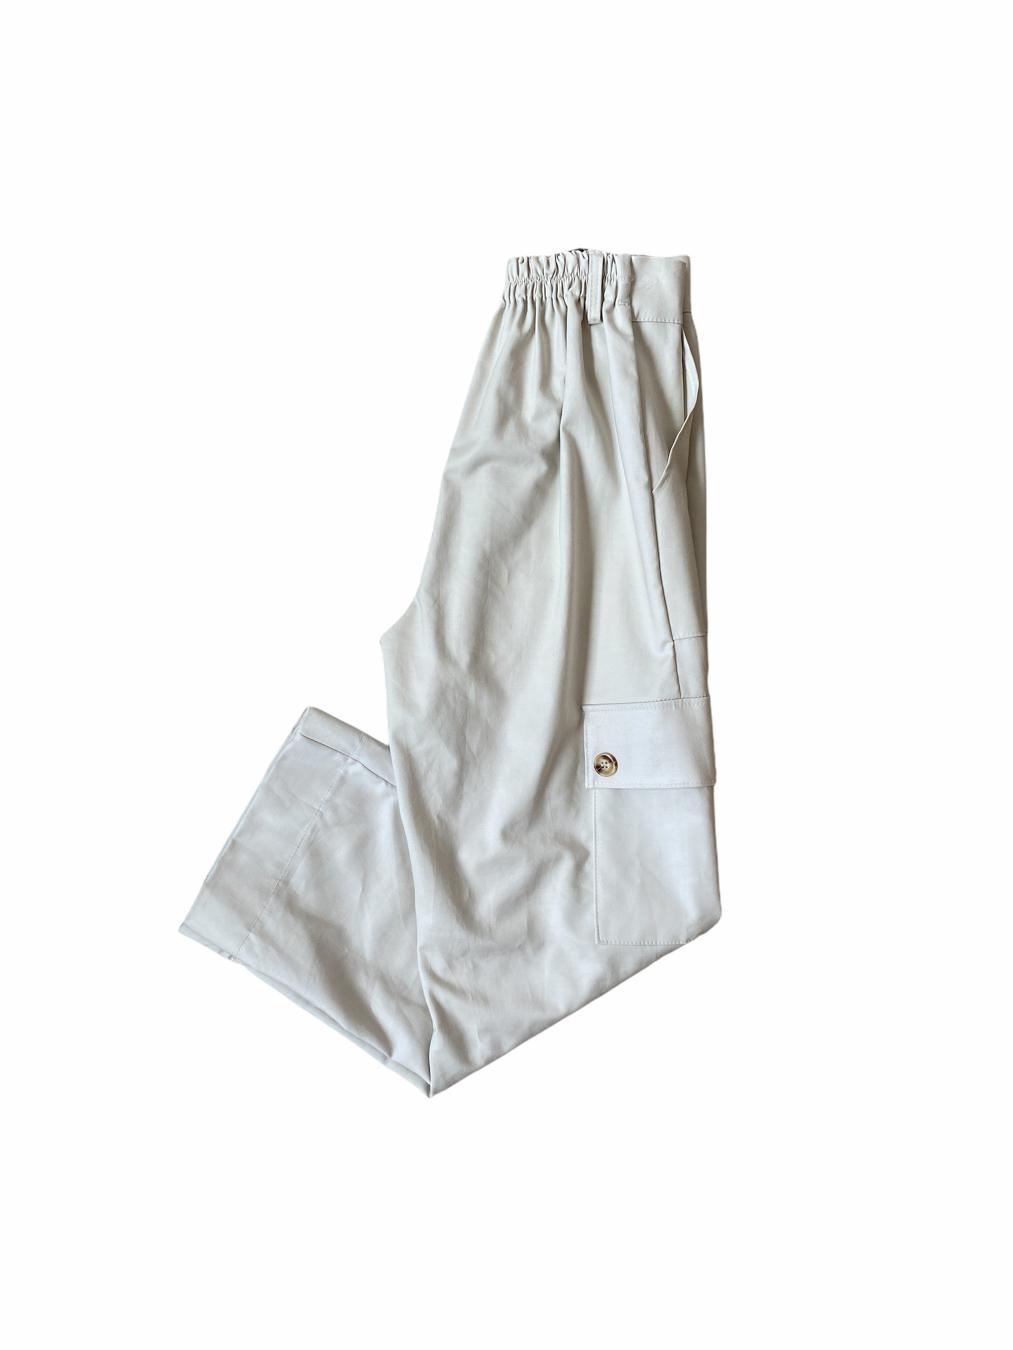 Cham Him Cargo Pants (Cream)